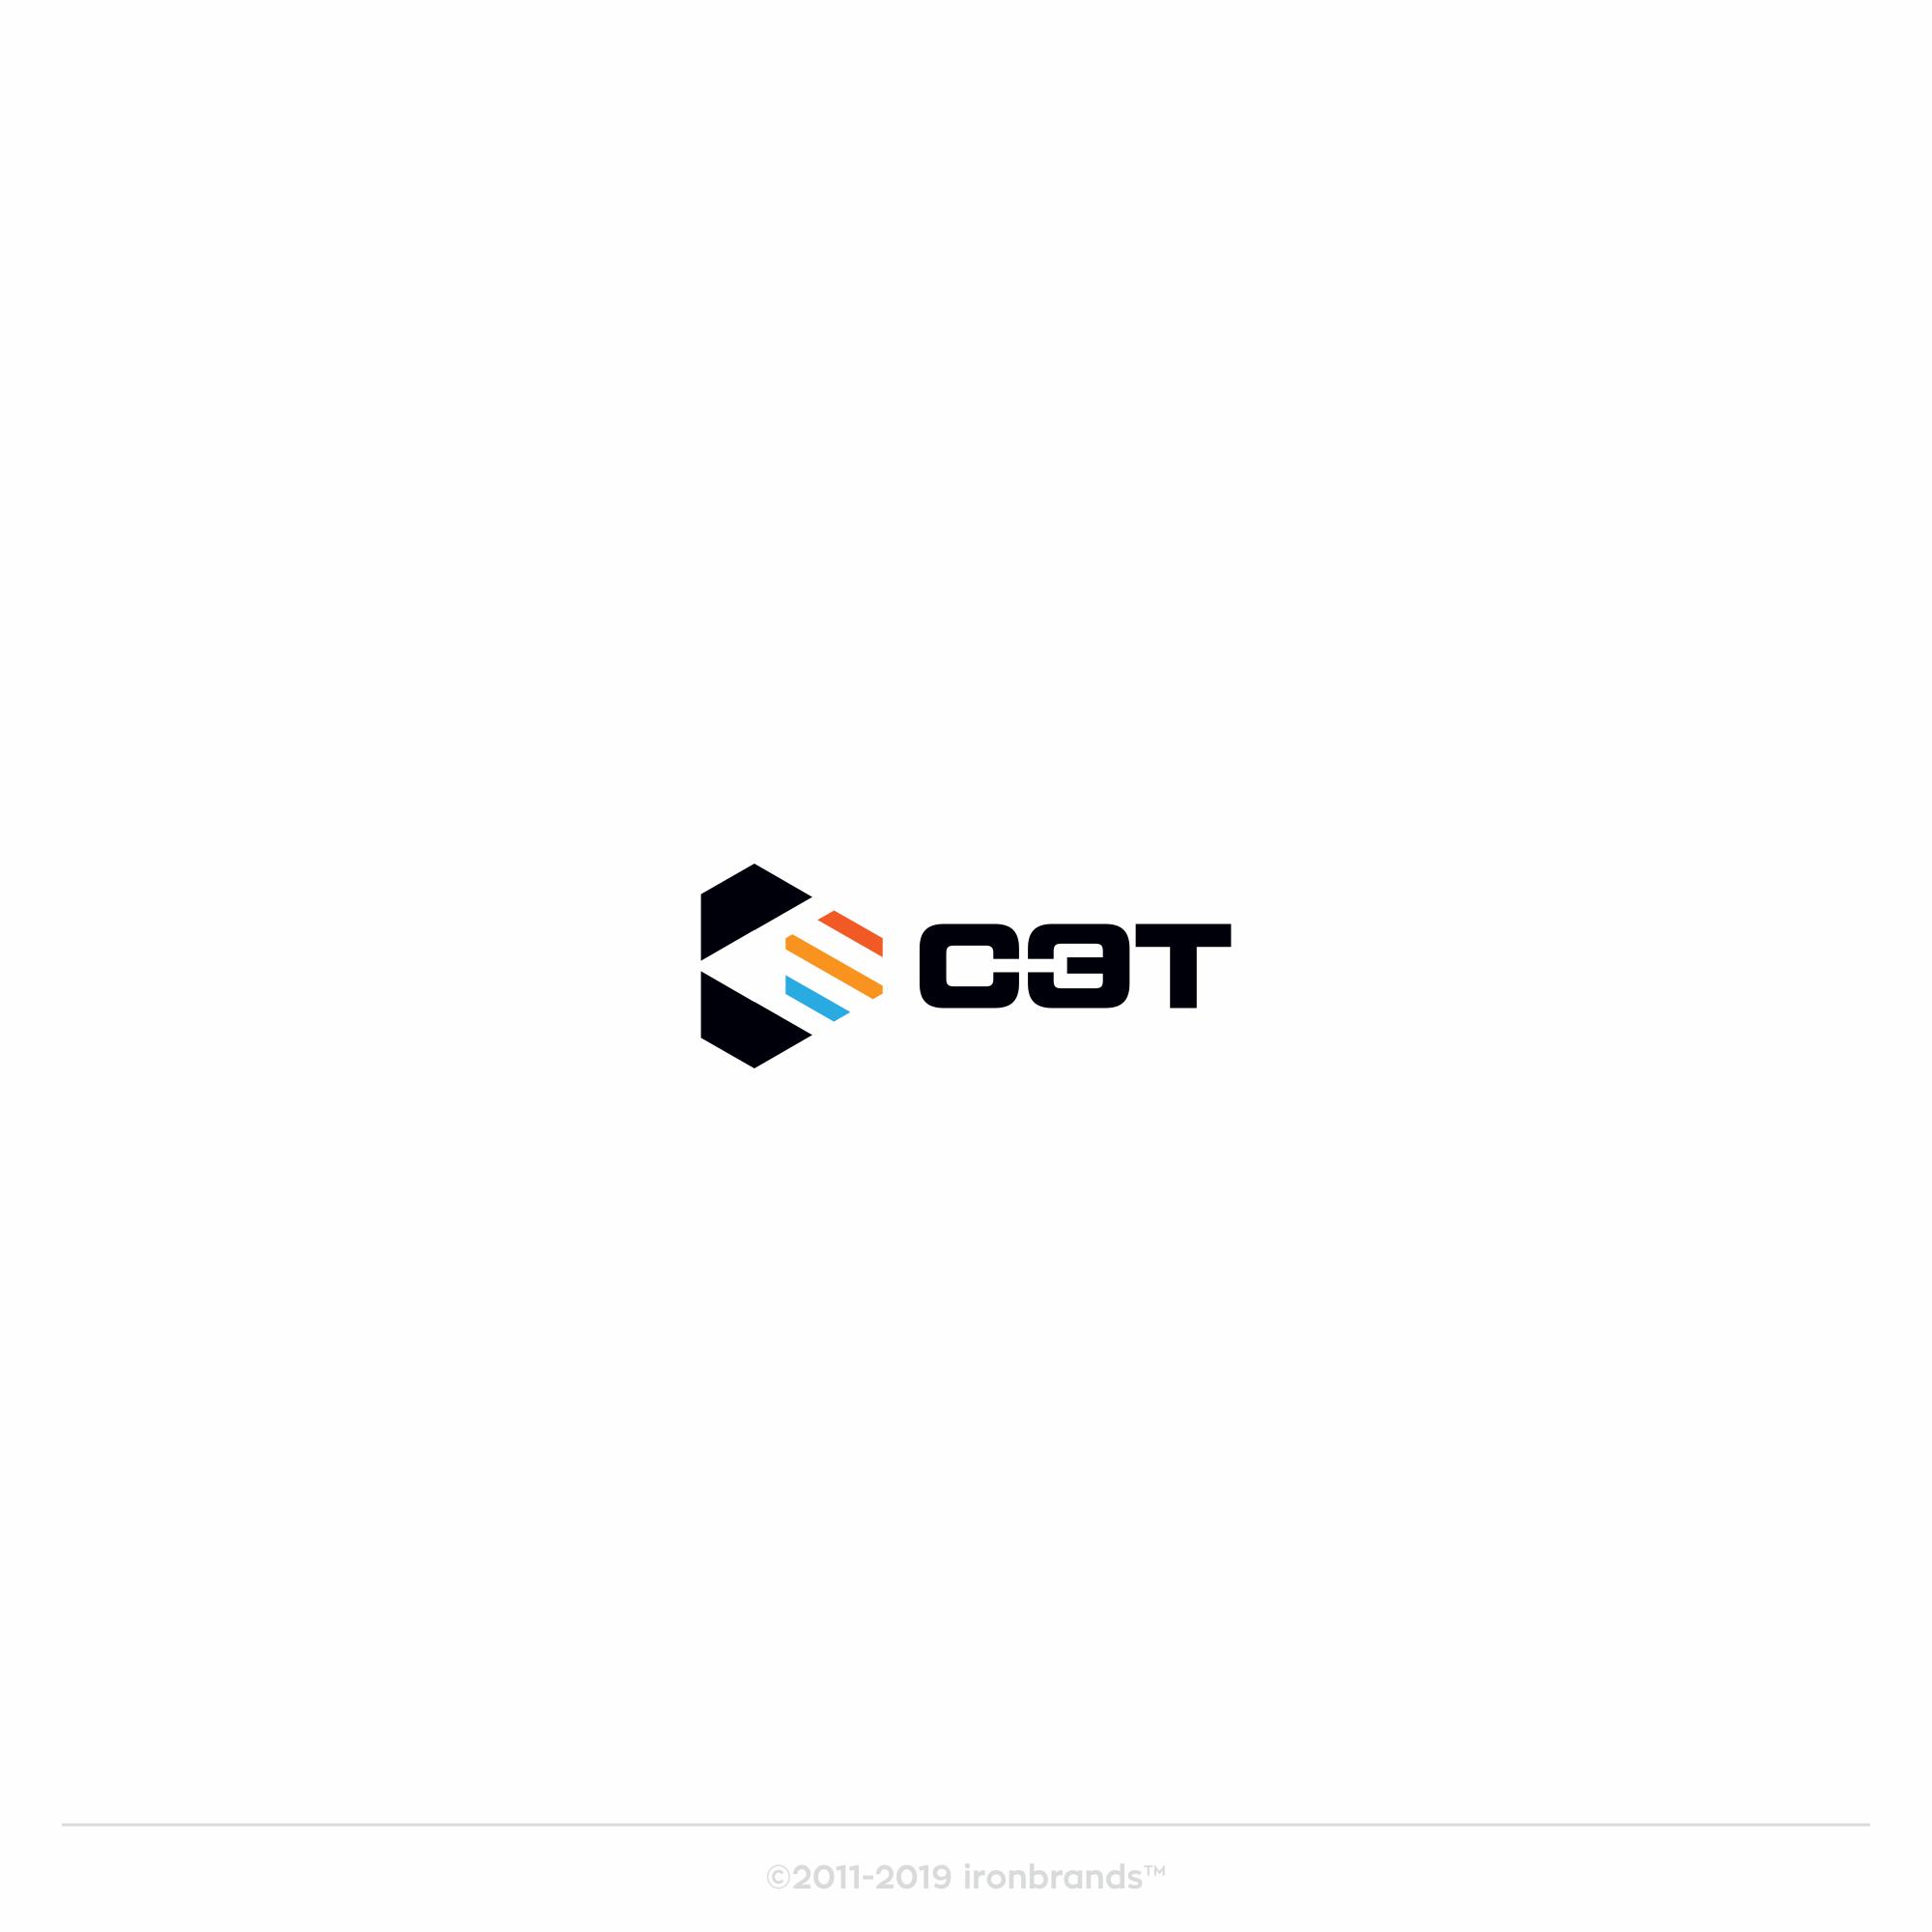 Срочно! Дизайн логотипа ООО «СЭТ» фото f_8565d53c109cf487.jpg